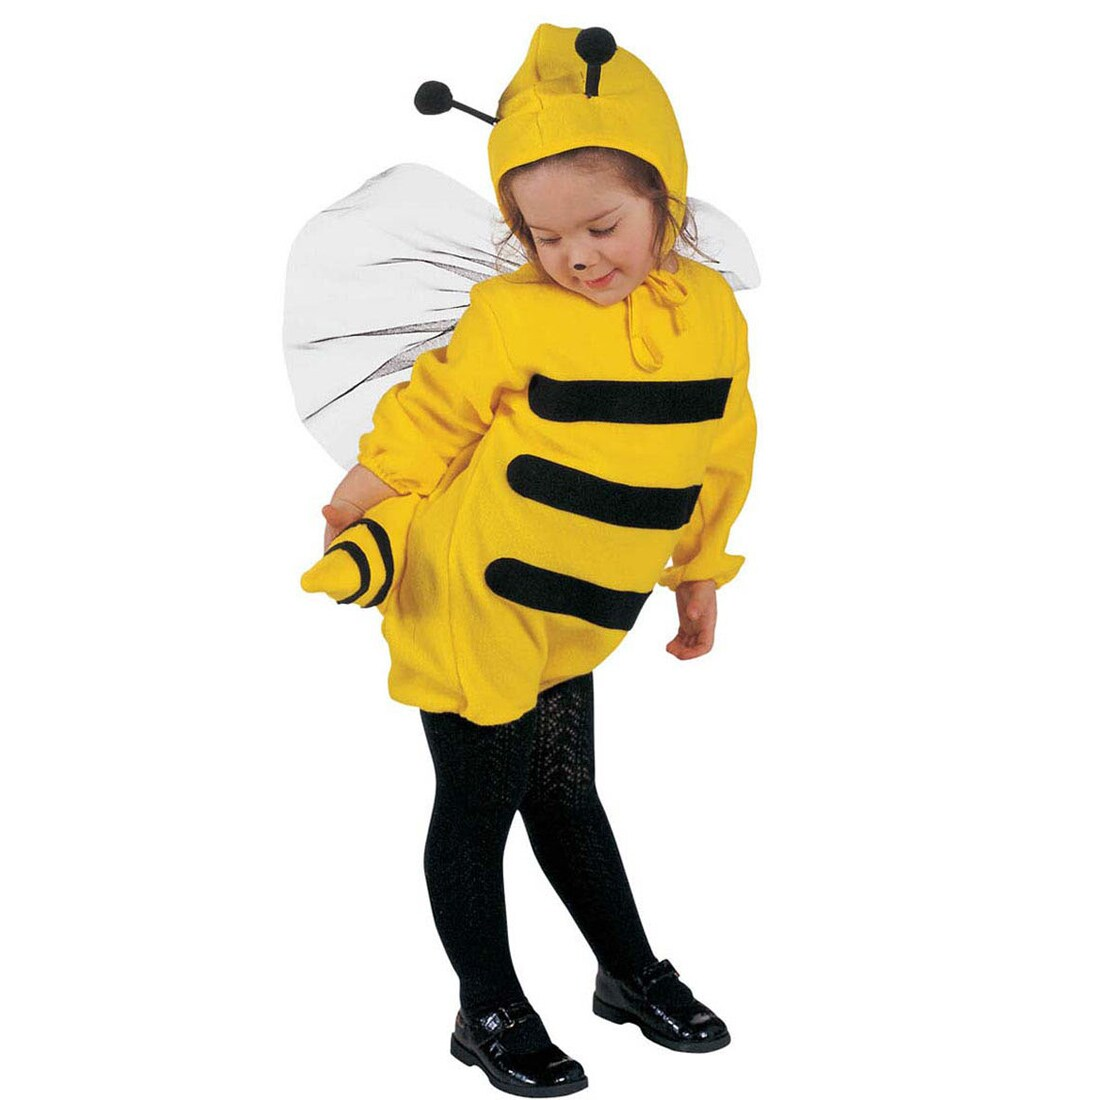 Kürbis Kinderkostüm Halloween Kinder Kostüm Pumpkin 90-98 cm Outfit Verkleidung